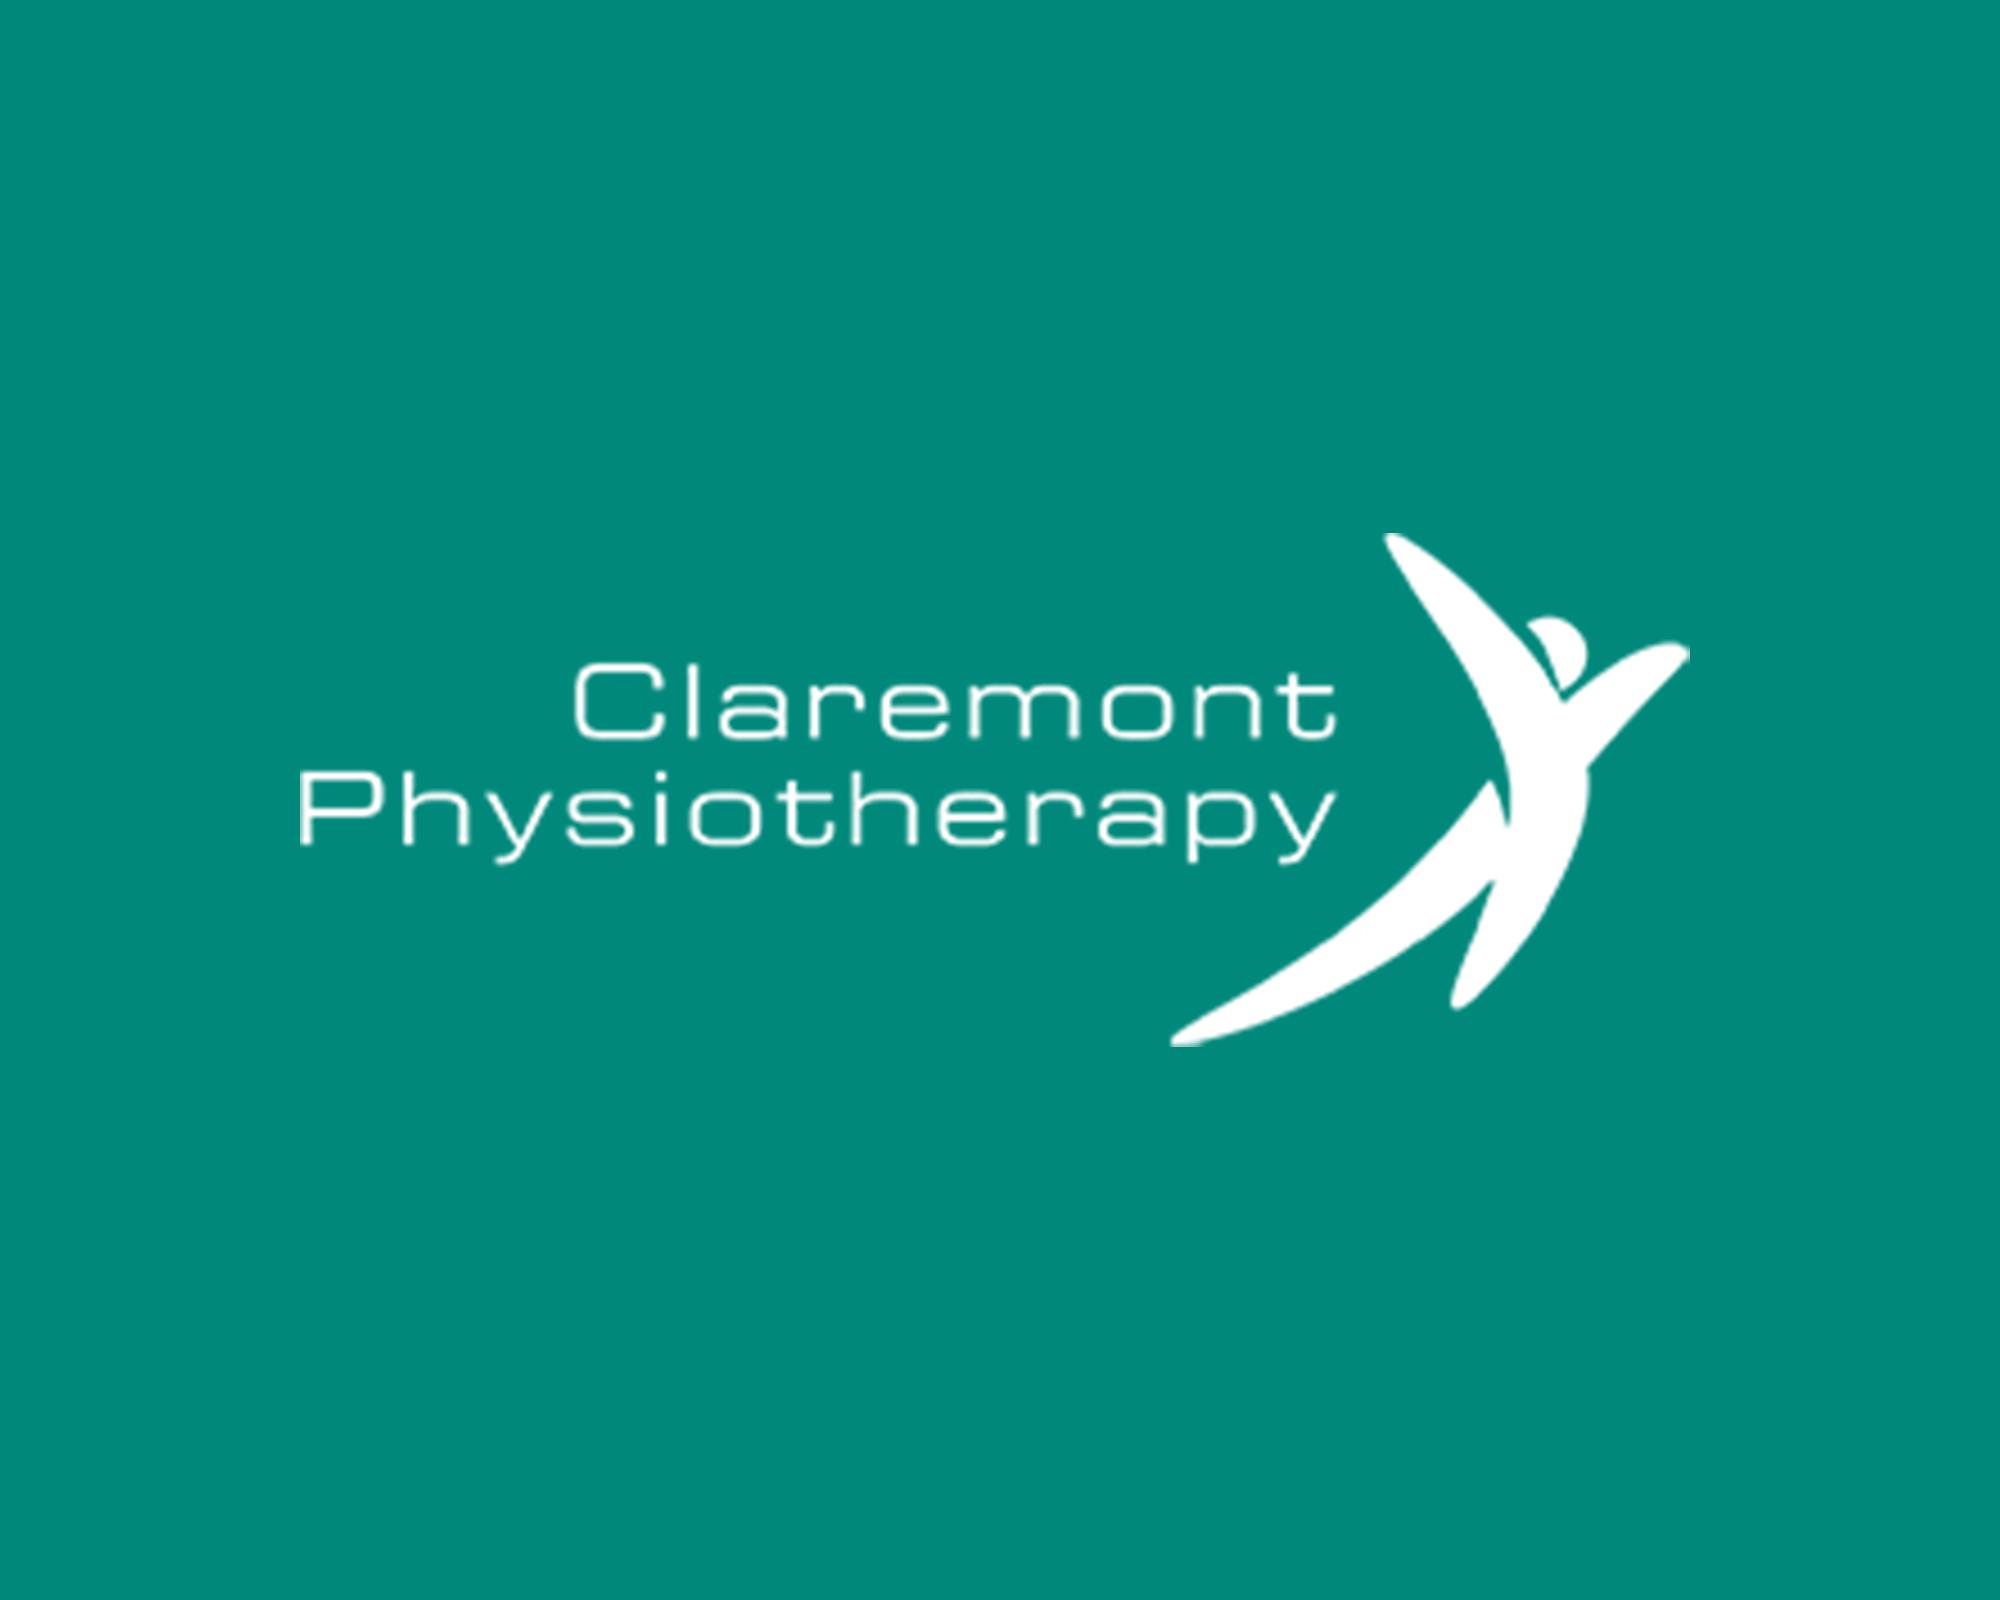 claremont physio Logo